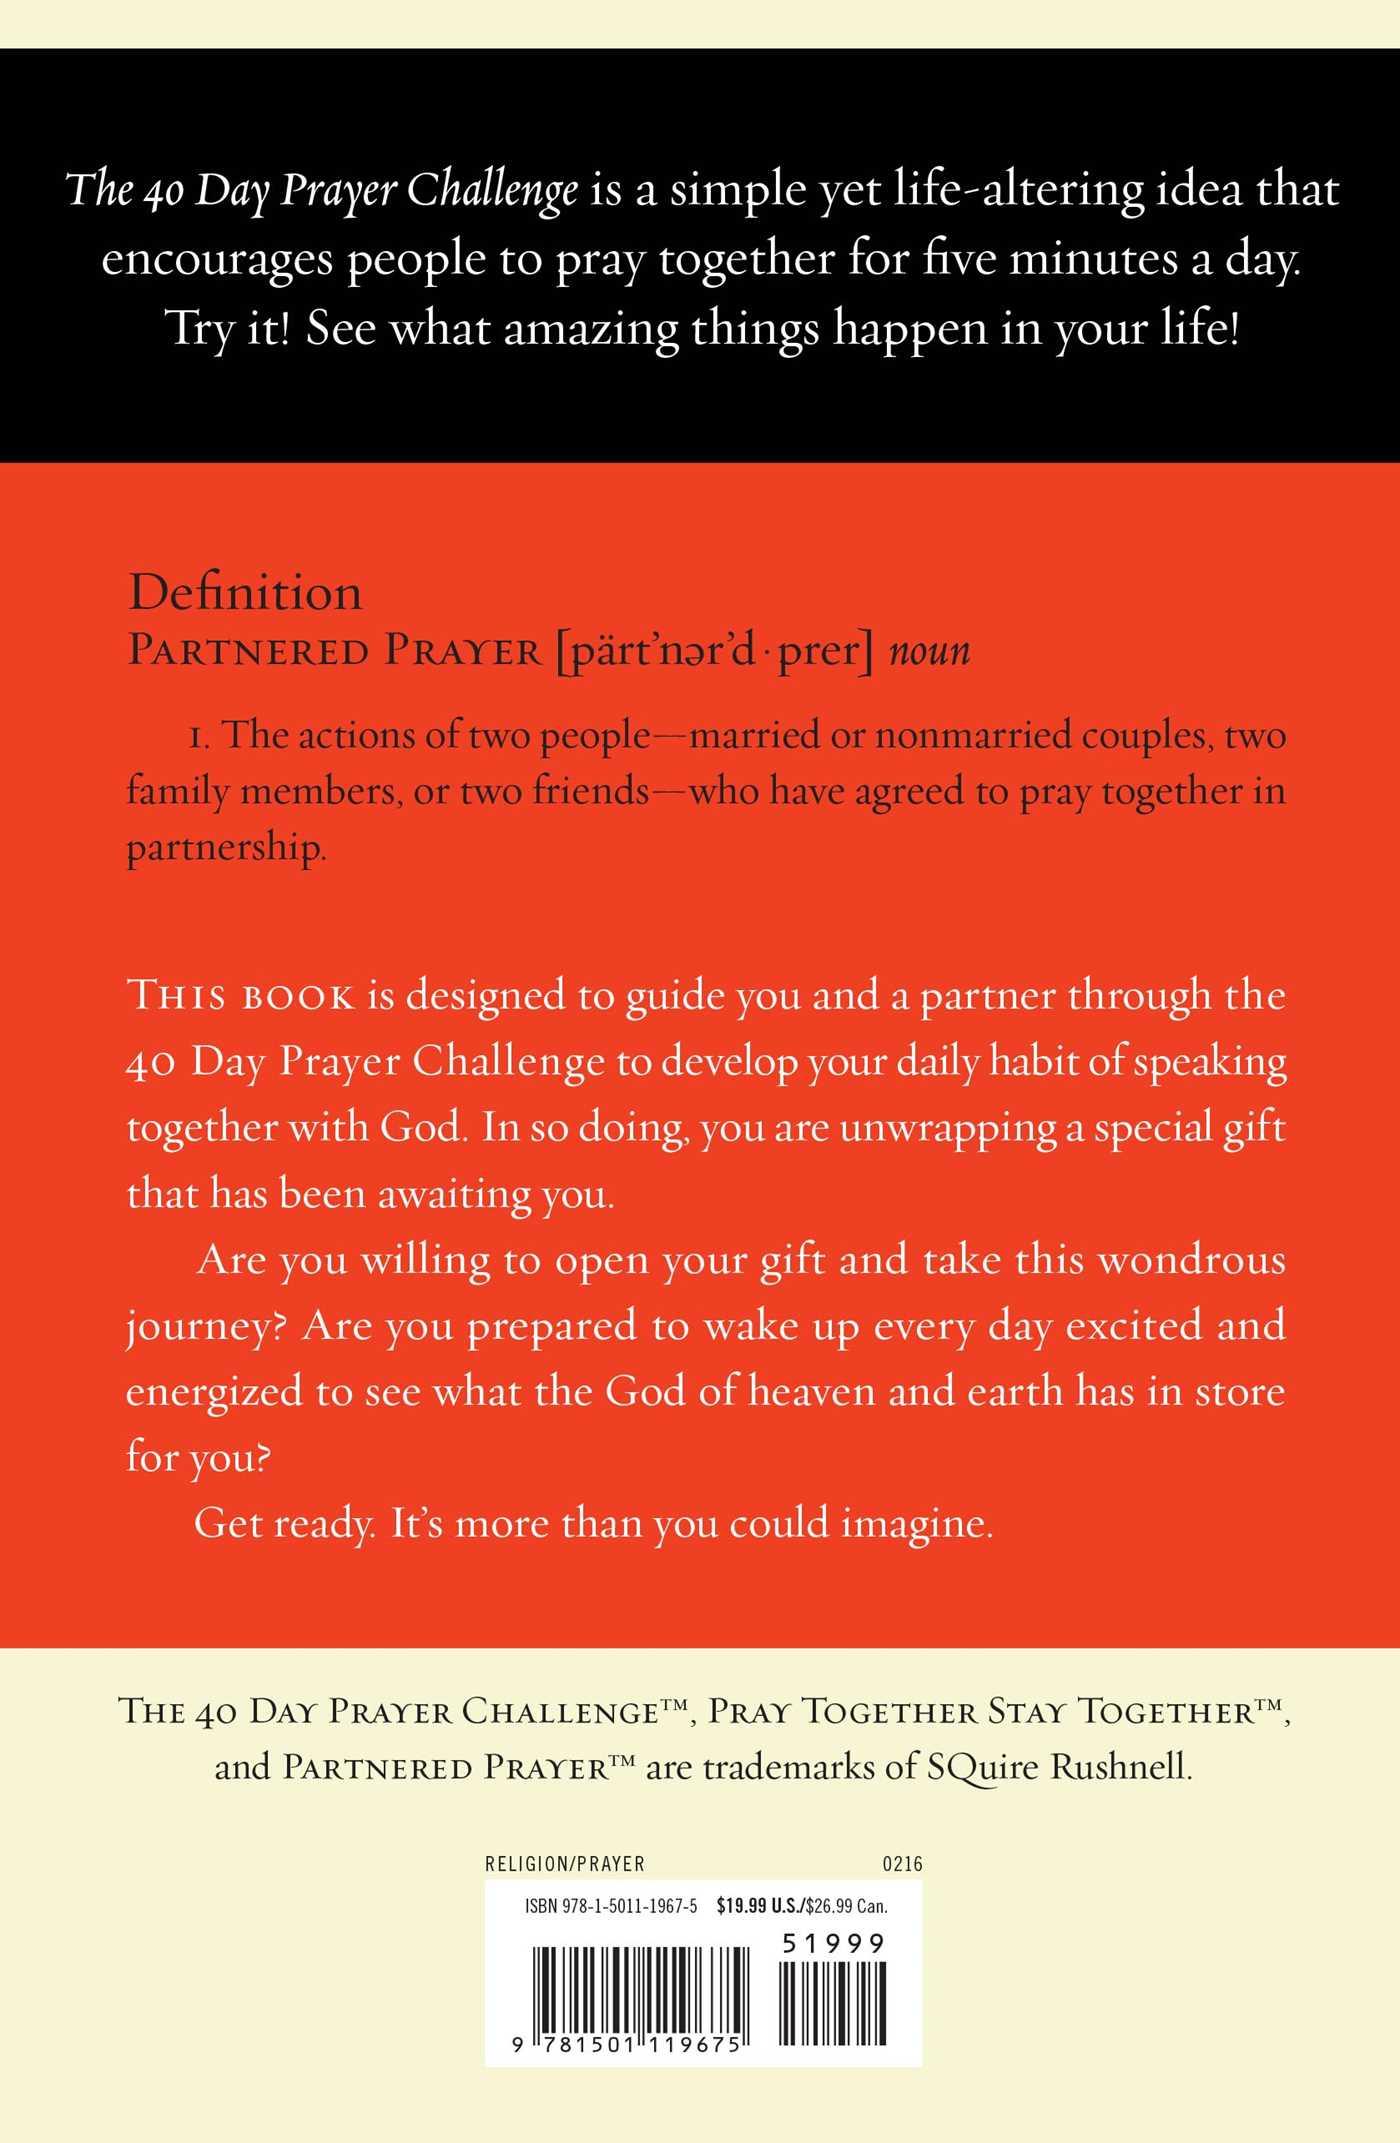 The 40 day prayer challenge 9781501119675 hr back